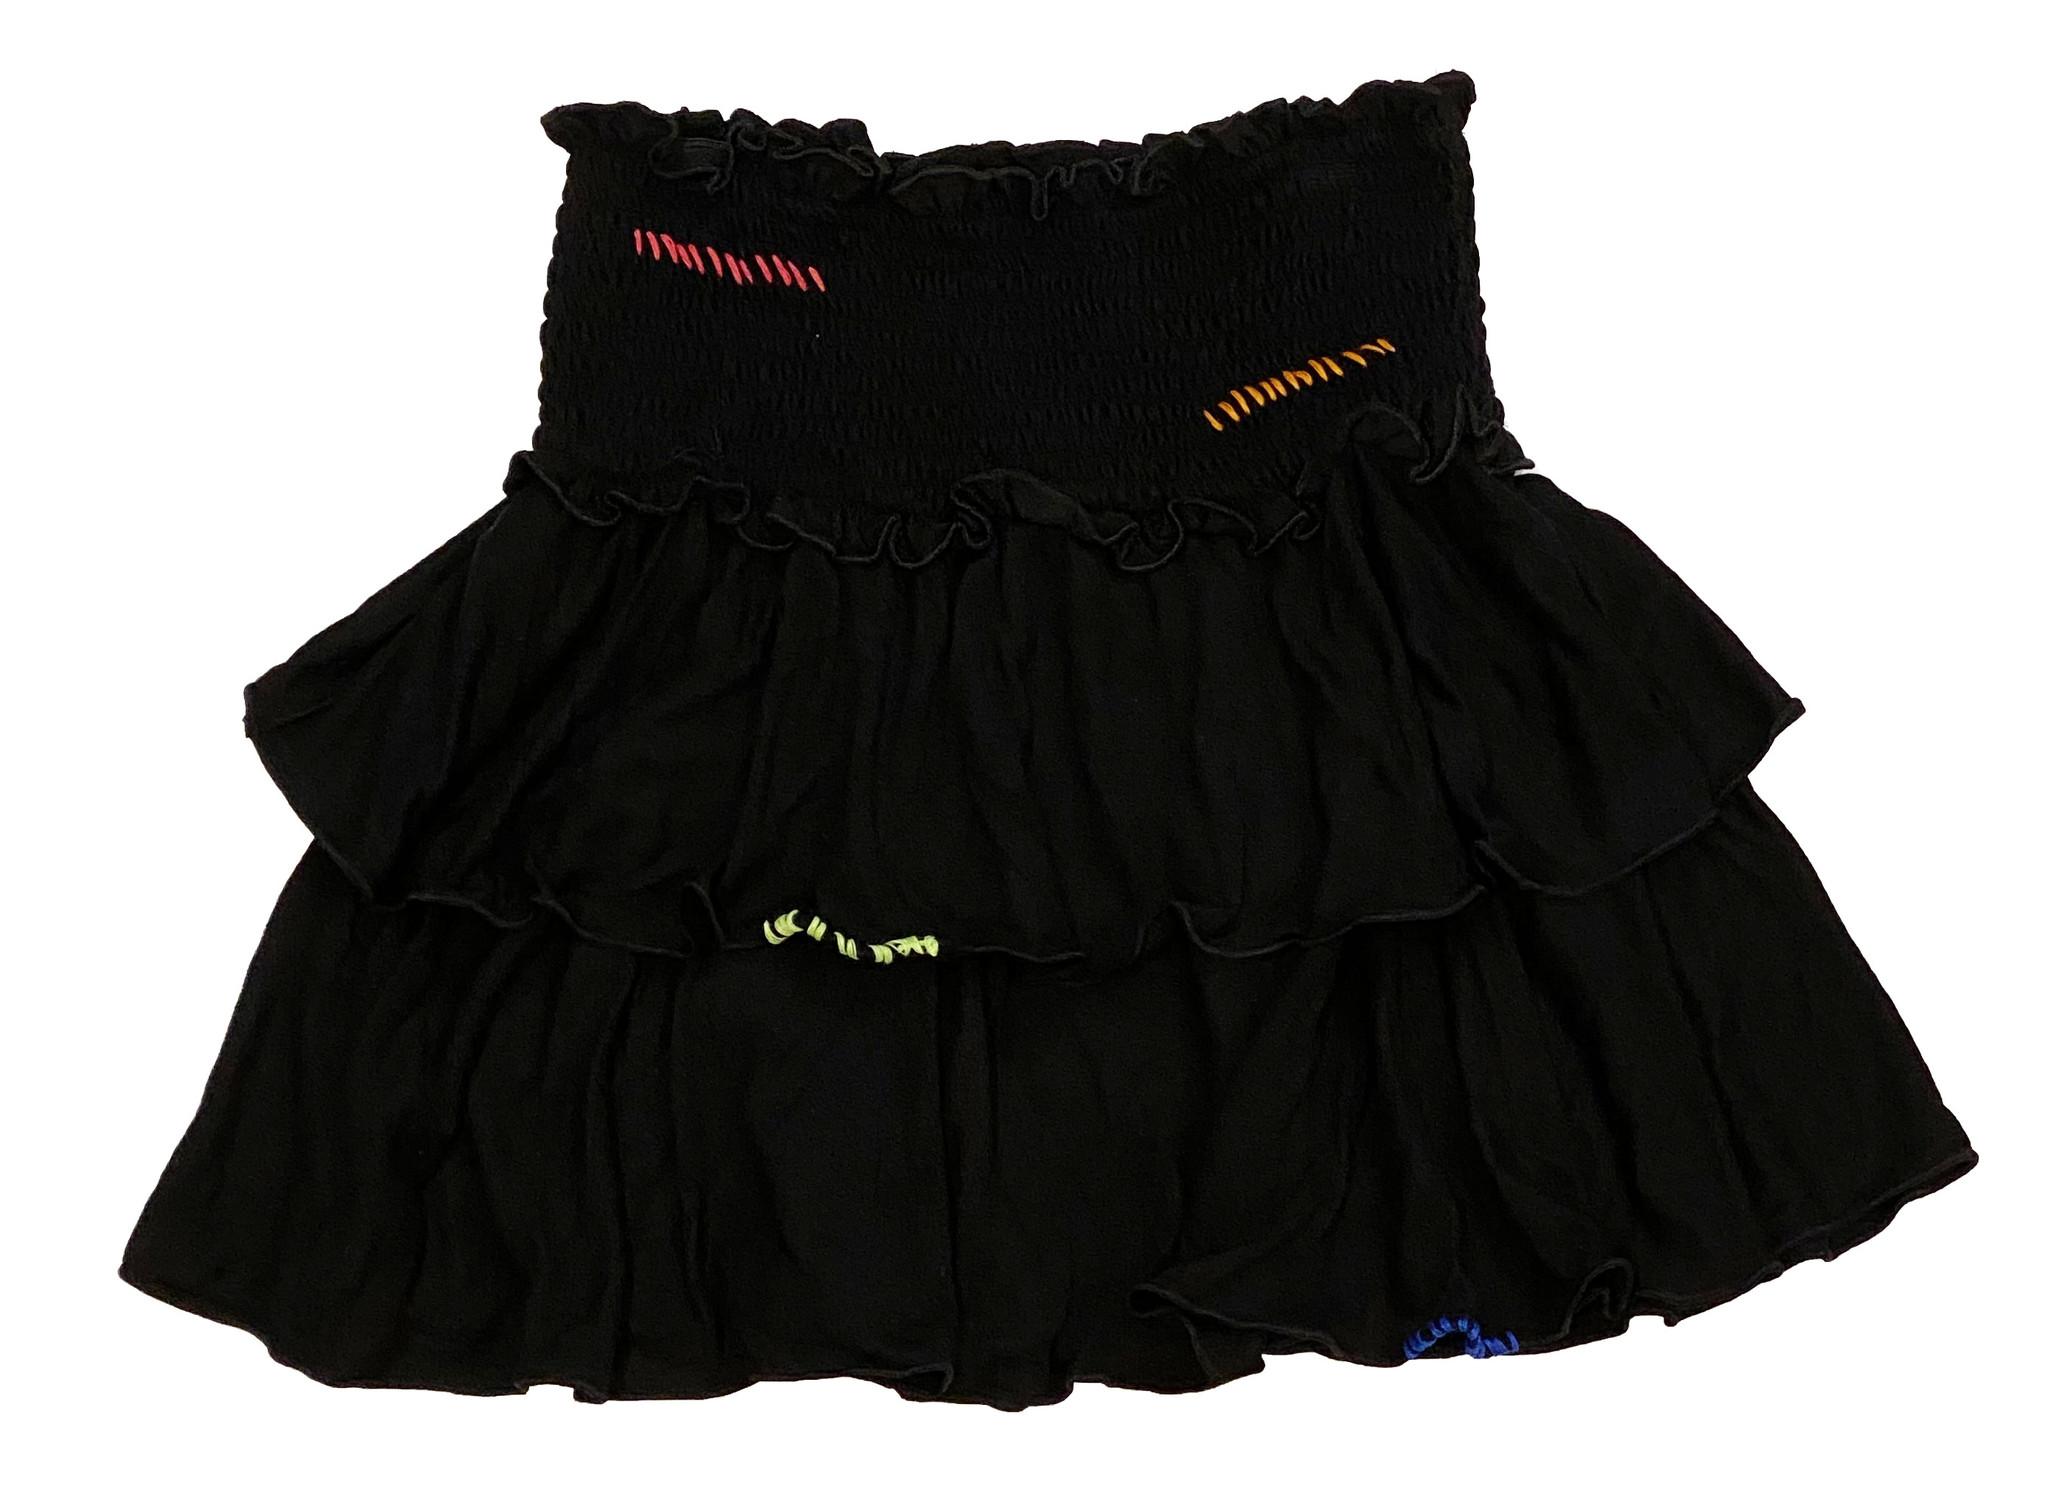 Flowers by Zoe Rainbow Stitched Black Skirt